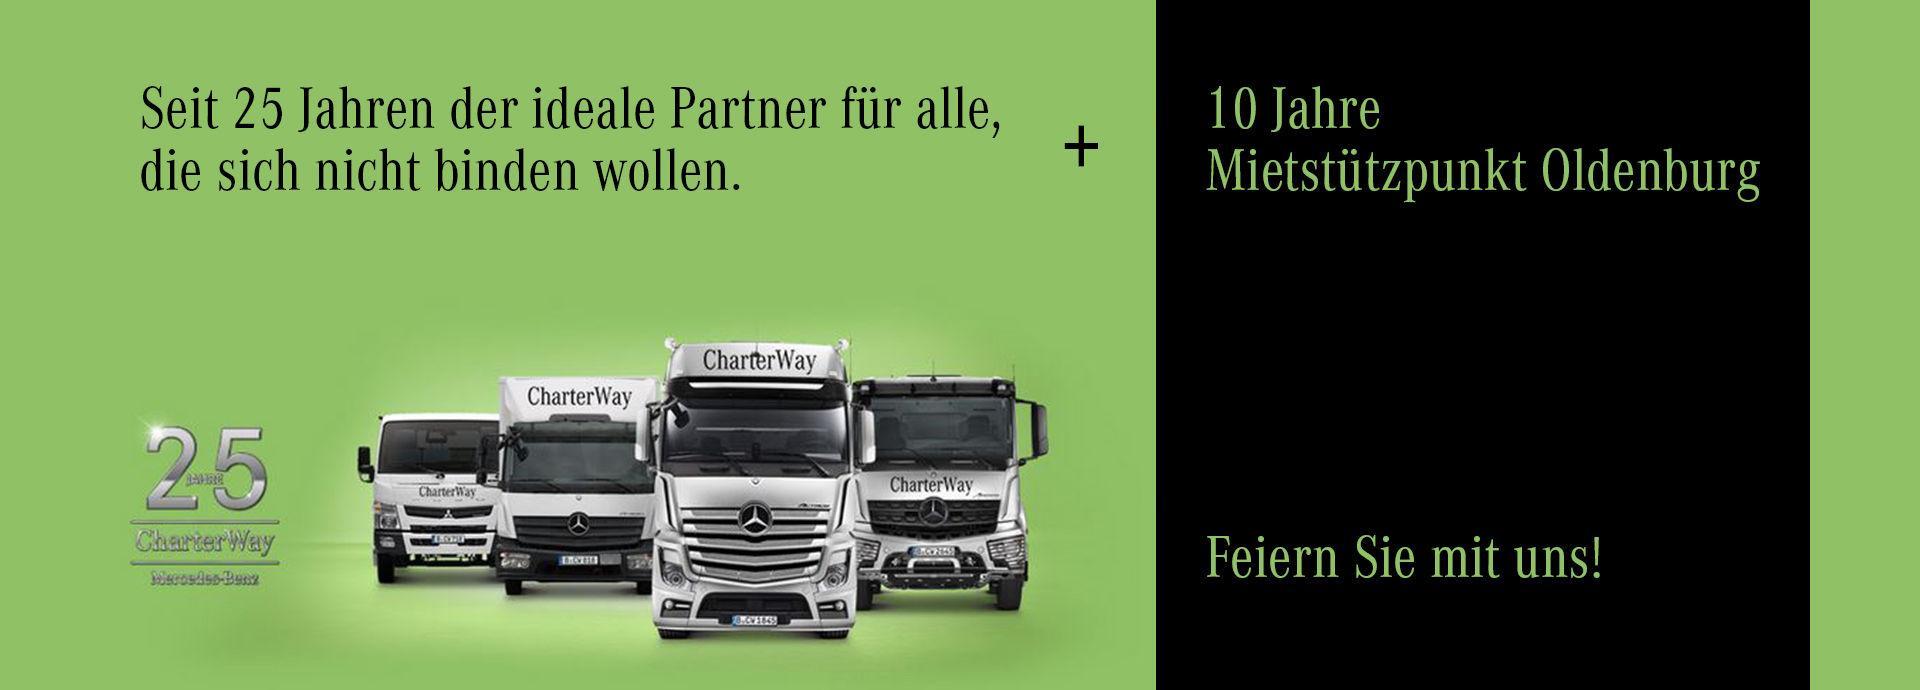 Cheap Transporter Mieten Oldenburg With Transporter Mieten Oldenburg